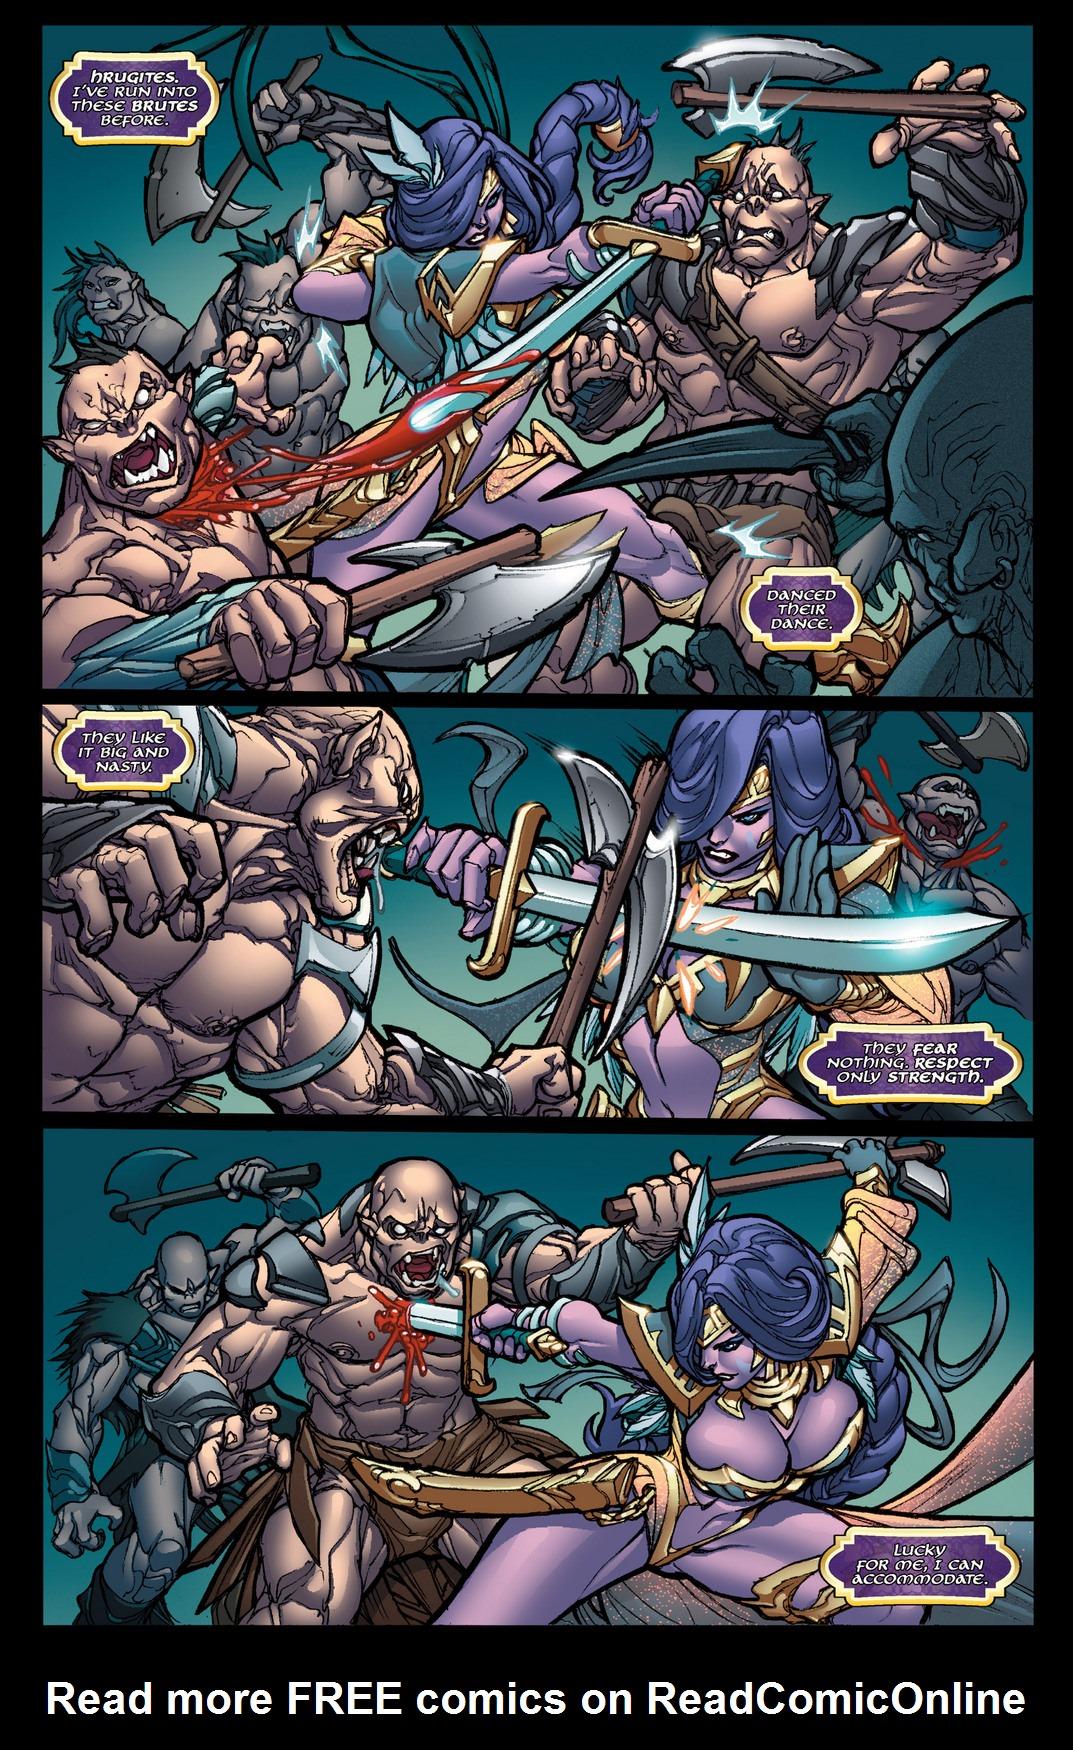 Read online Jirni comic -  Issue #1 - 6